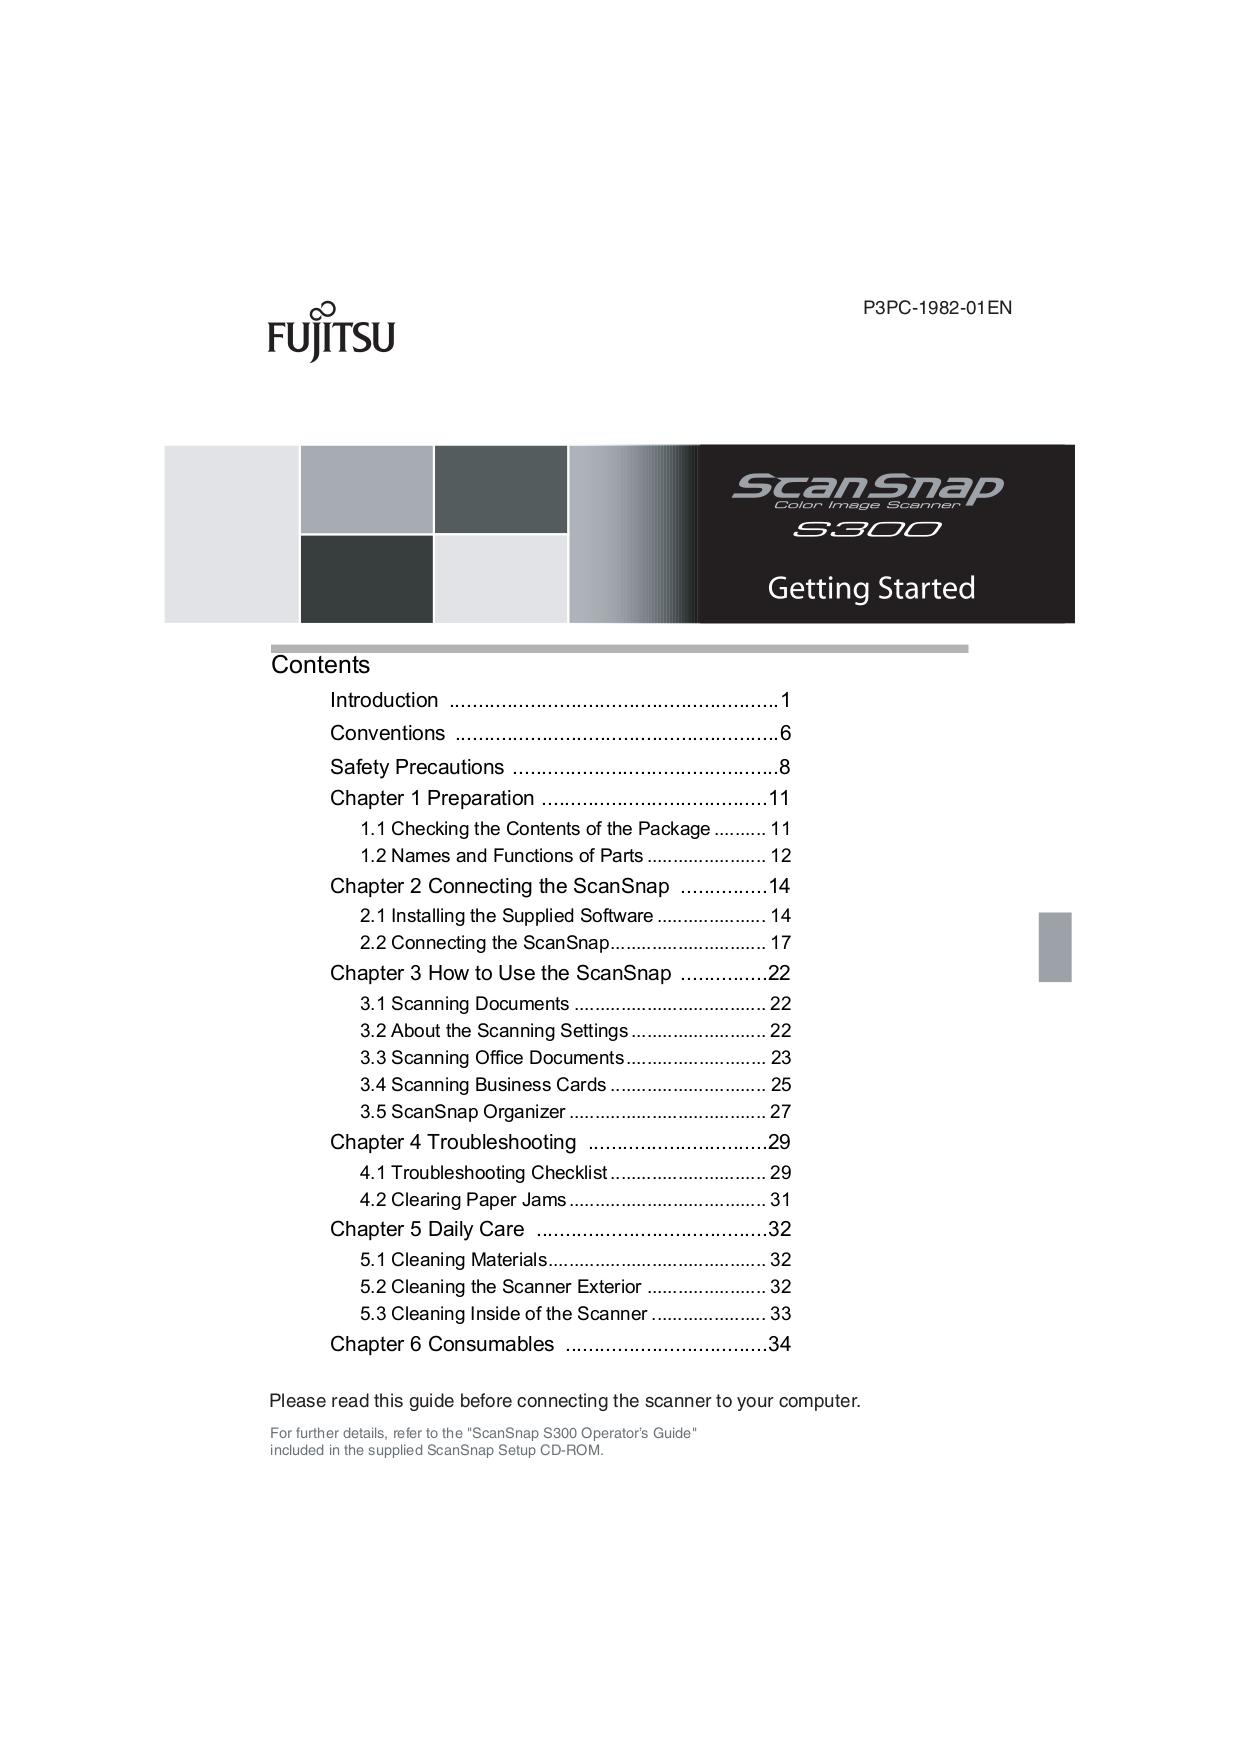 pdf for NAD Storage S300 manual